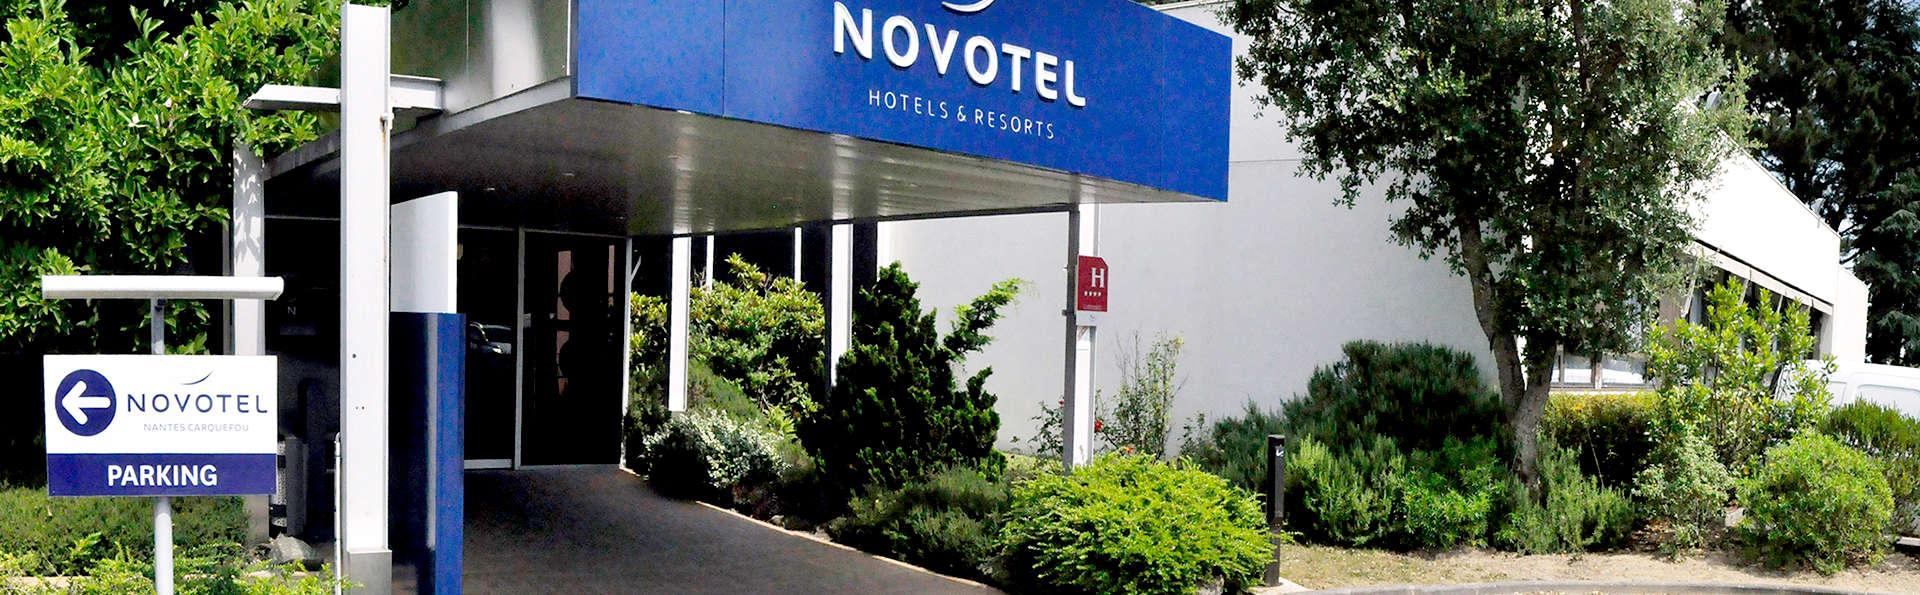 Novotel Nantes Carquefou - EDIT_NEW_FRONT.jpg